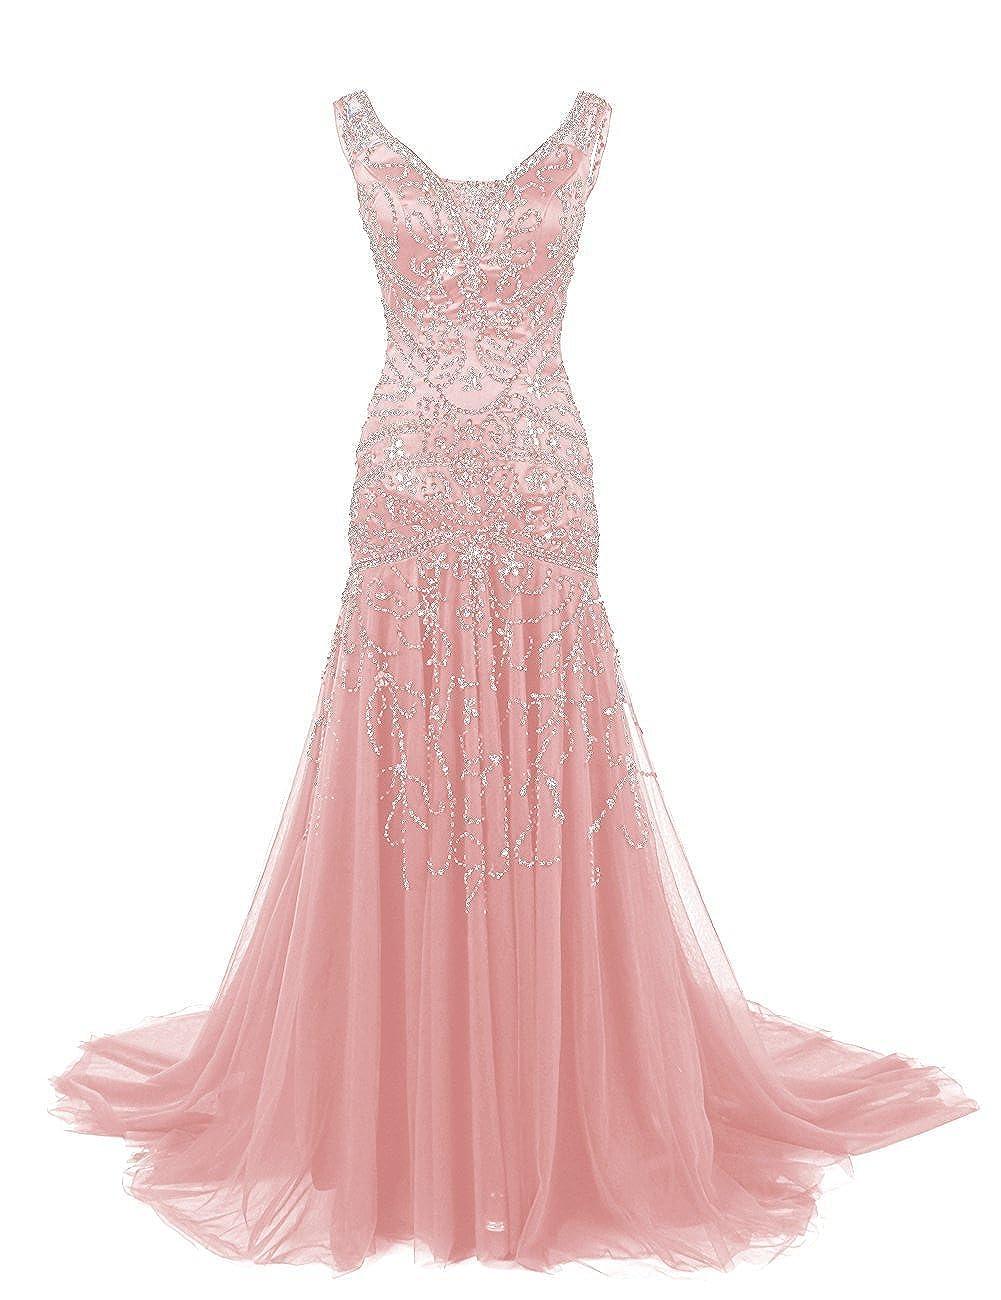 bluesh Ellenhouse Women's Long Mermaid Mother of Bride Dress Beaded Prom Ball Gowns